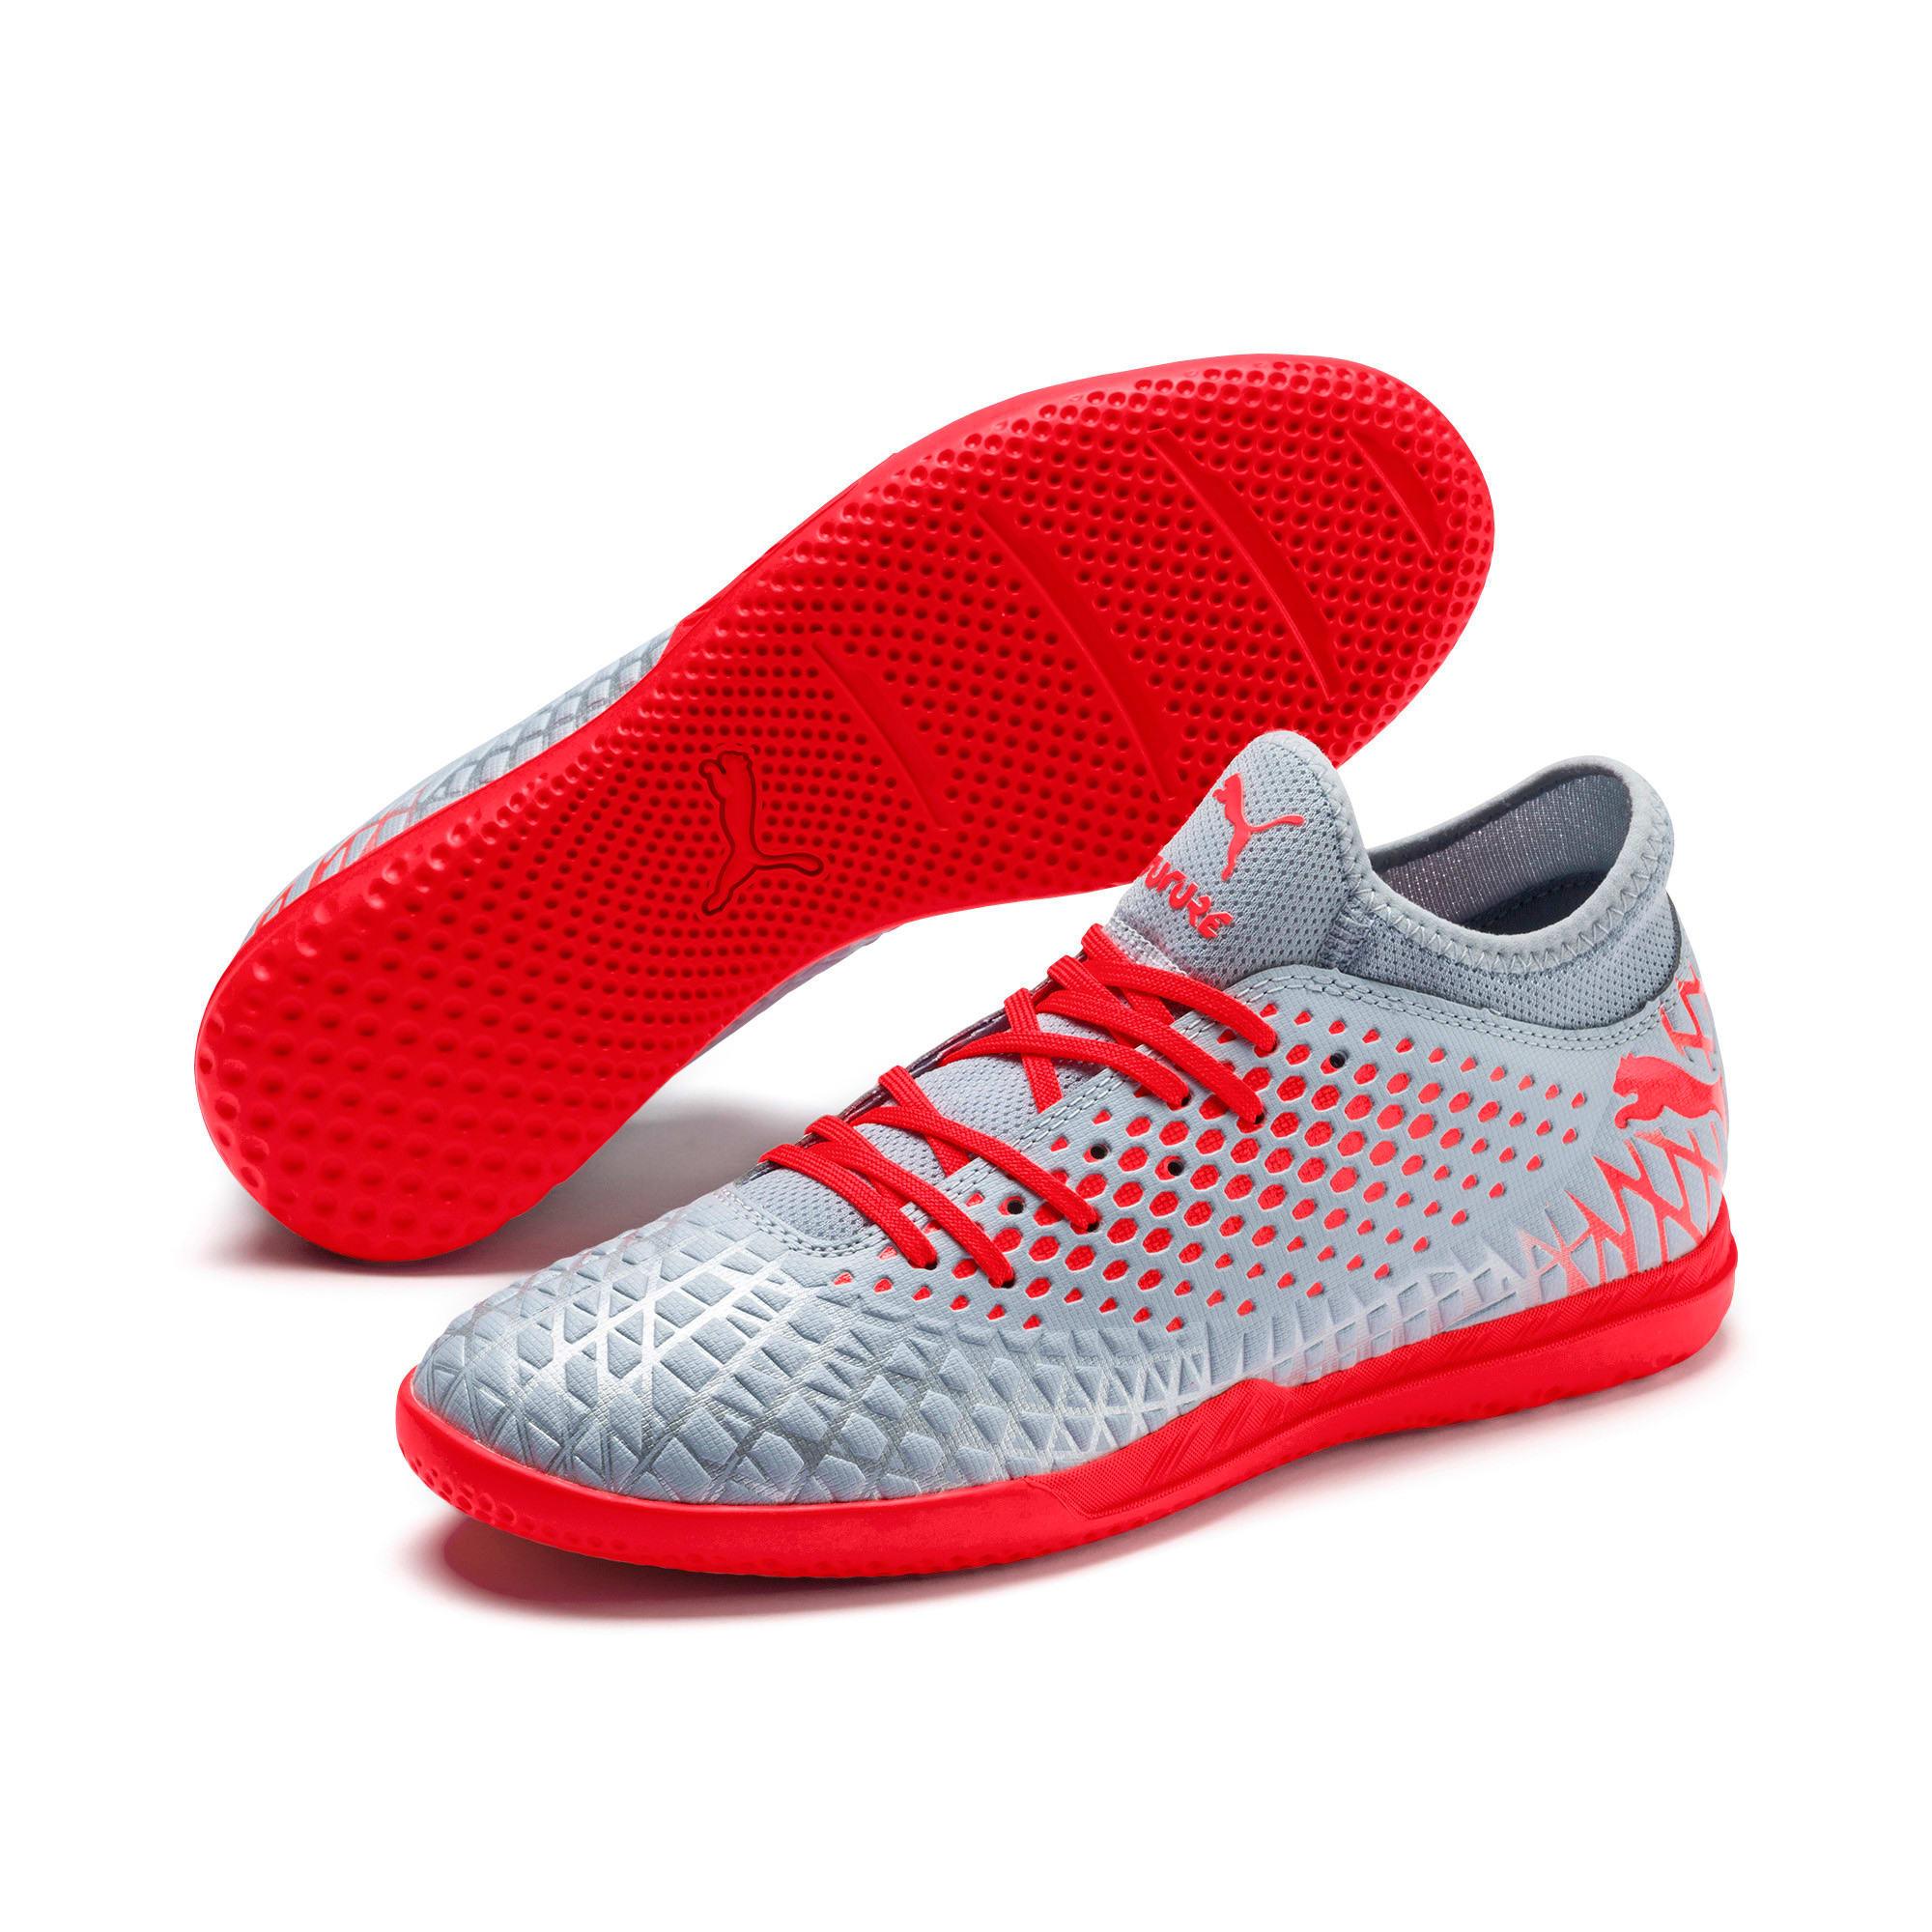 Thumbnail 3 of FUTURE 4.4 IT Men's Soccer Shoes, Glacial Blue-Nrgy Red, medium